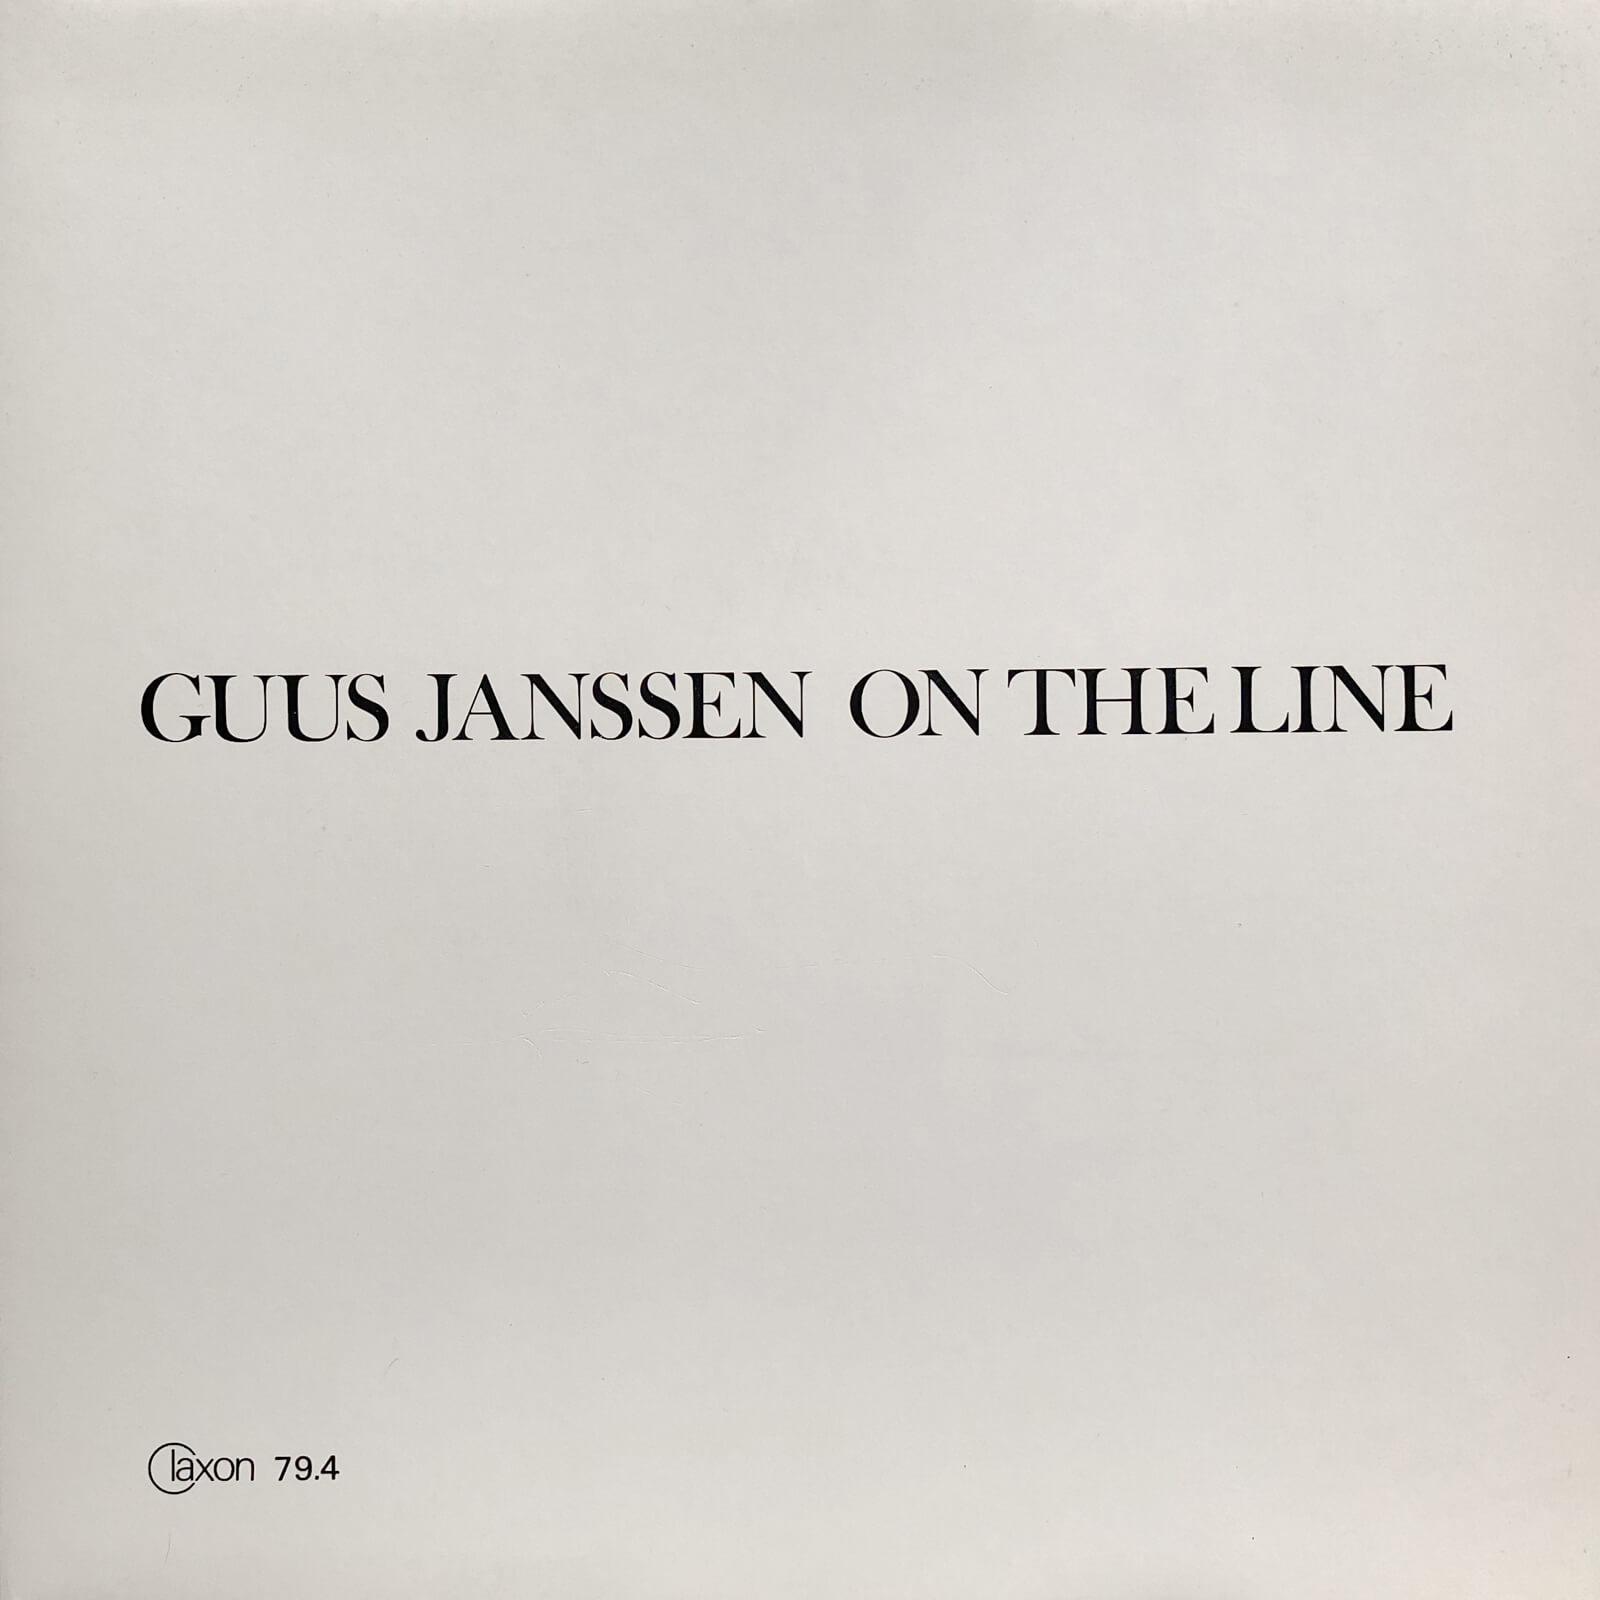 2018-09-06 - guus-janssen-on-the-line-website.jpg